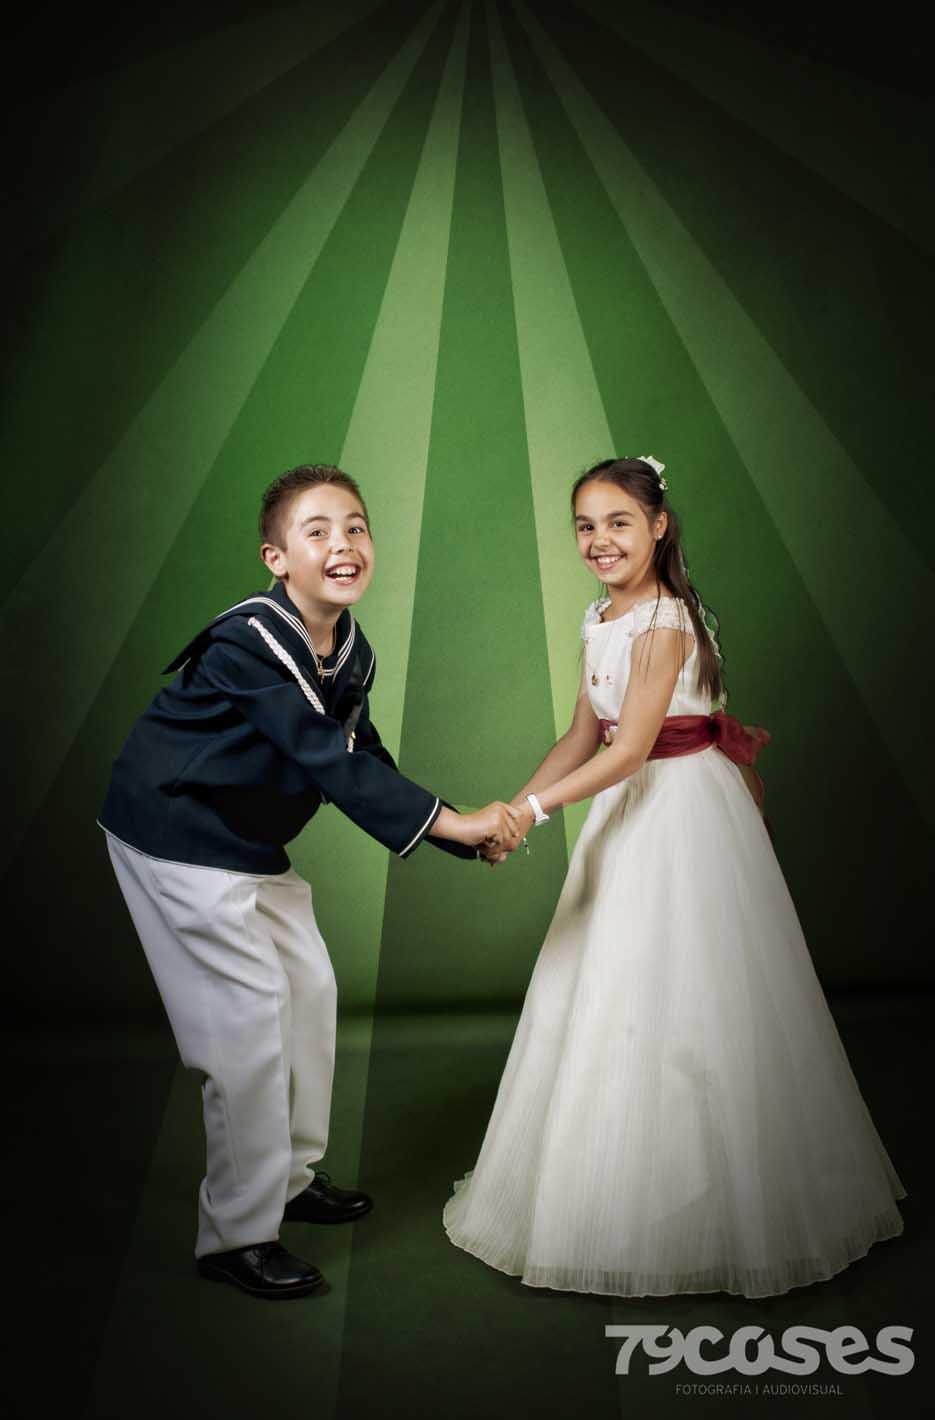 fotografía , Alicante, comunion, Jijona, infantil, 79COSES